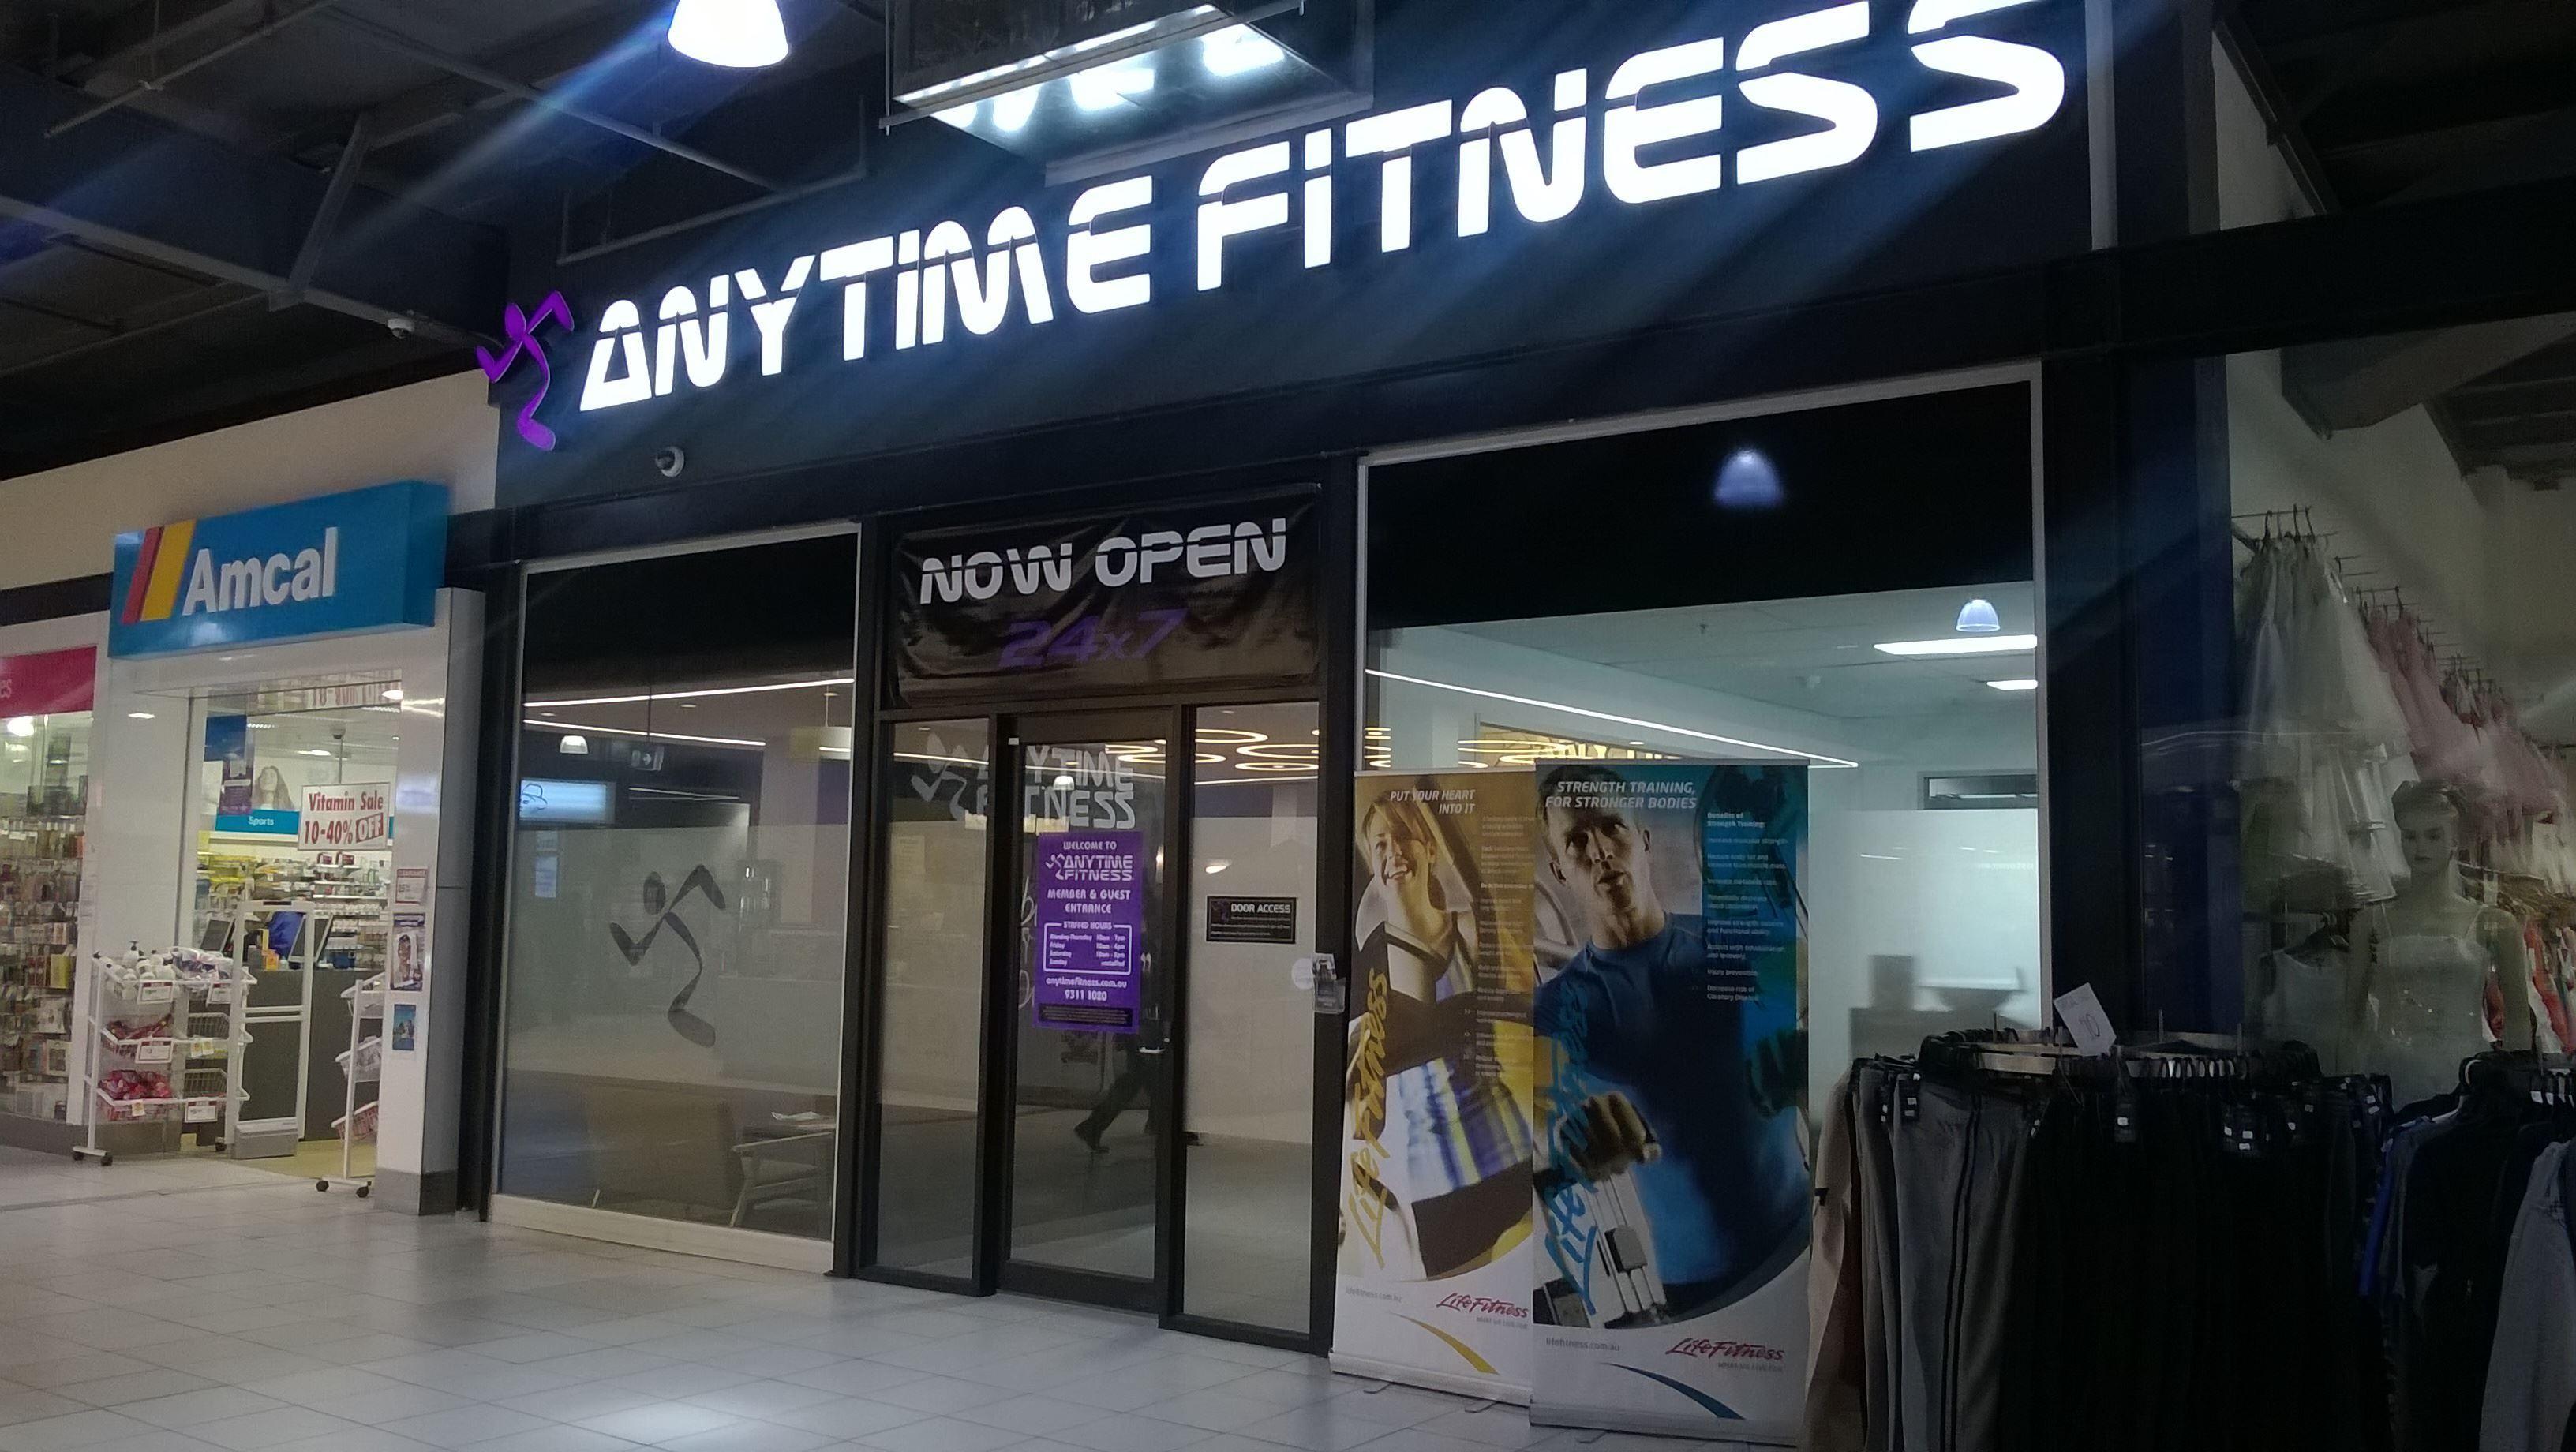 Anytime Fitness Sunshine 24 Hour Gym